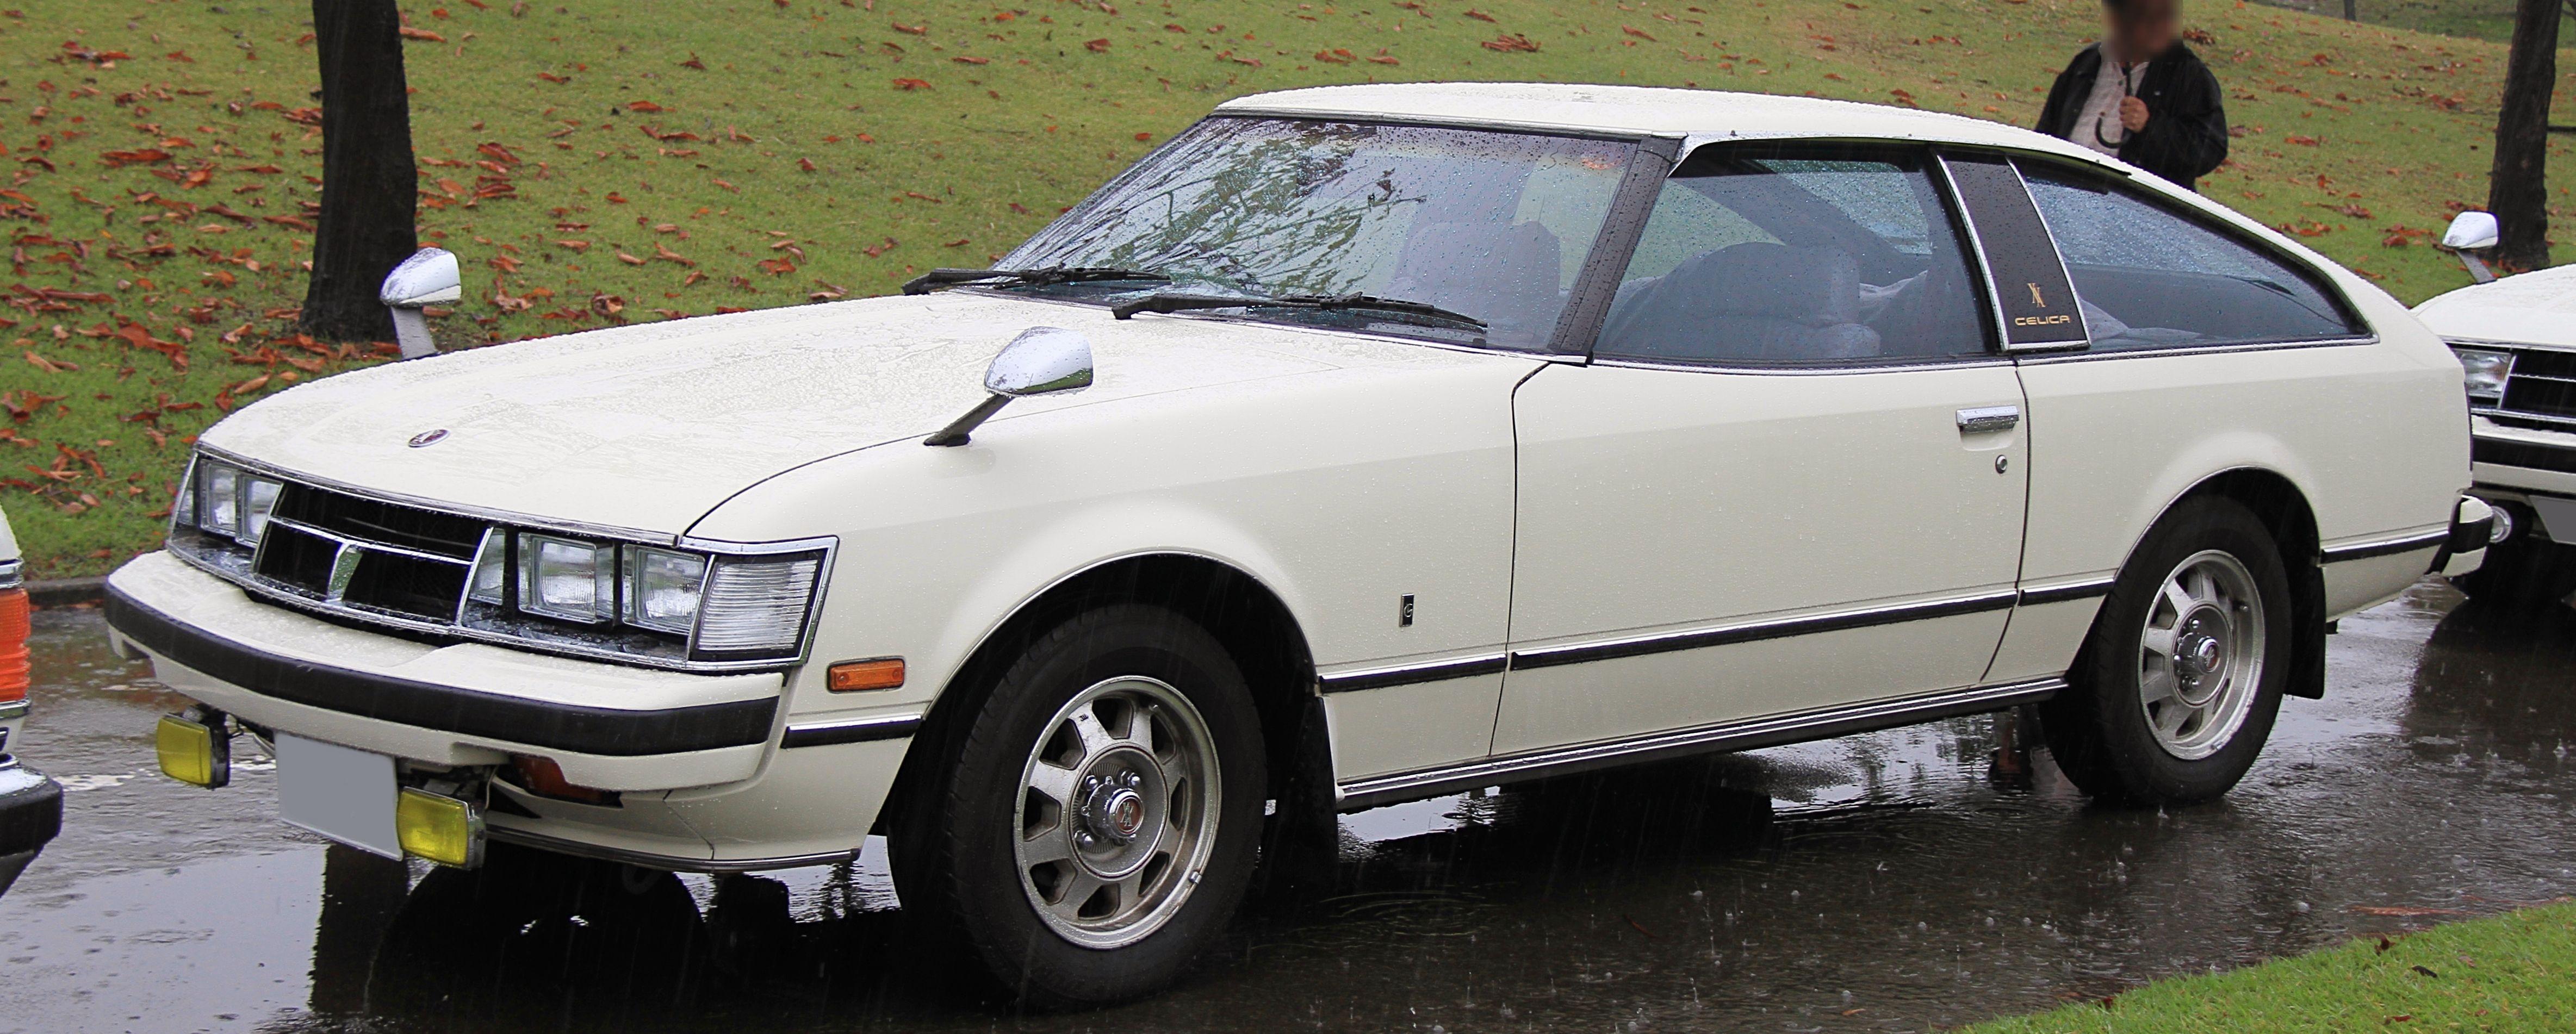 1979 Toyota Celica XX 2000G.jpg